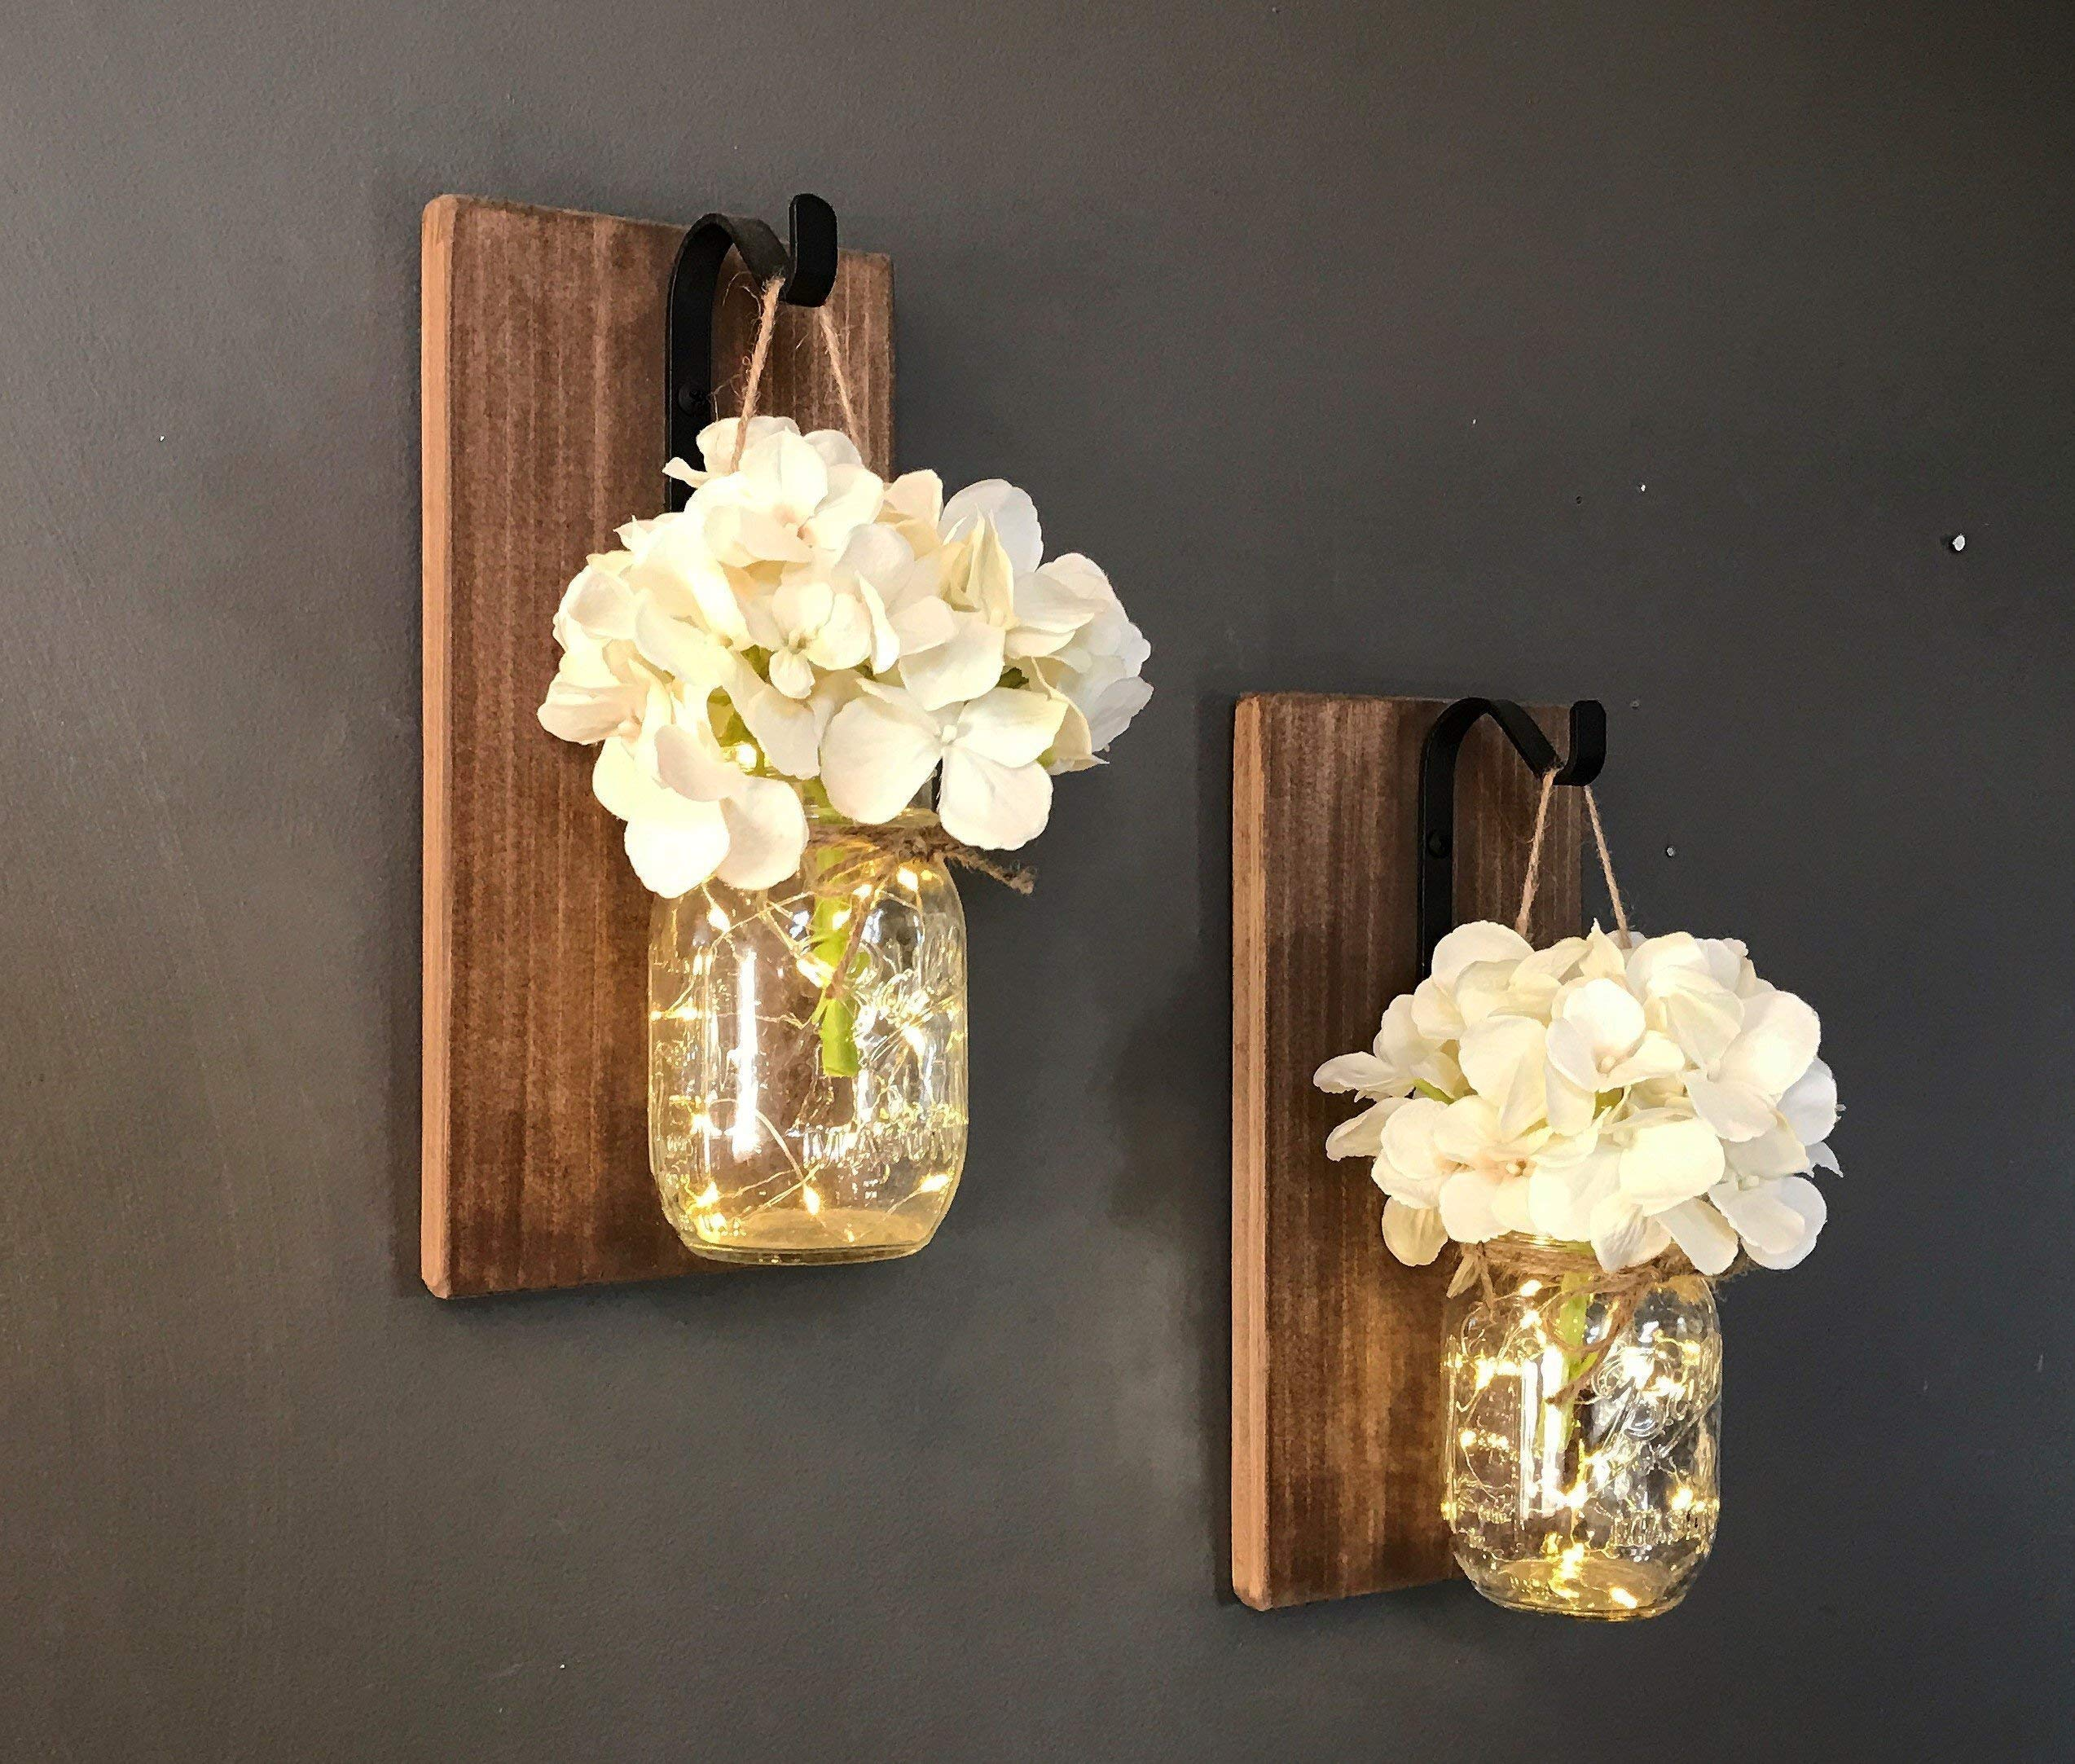 Set of 2 Mason Jar Sconces, Hanging Sconce, Mason Jar Decor, Wall Sconce, Home Decor